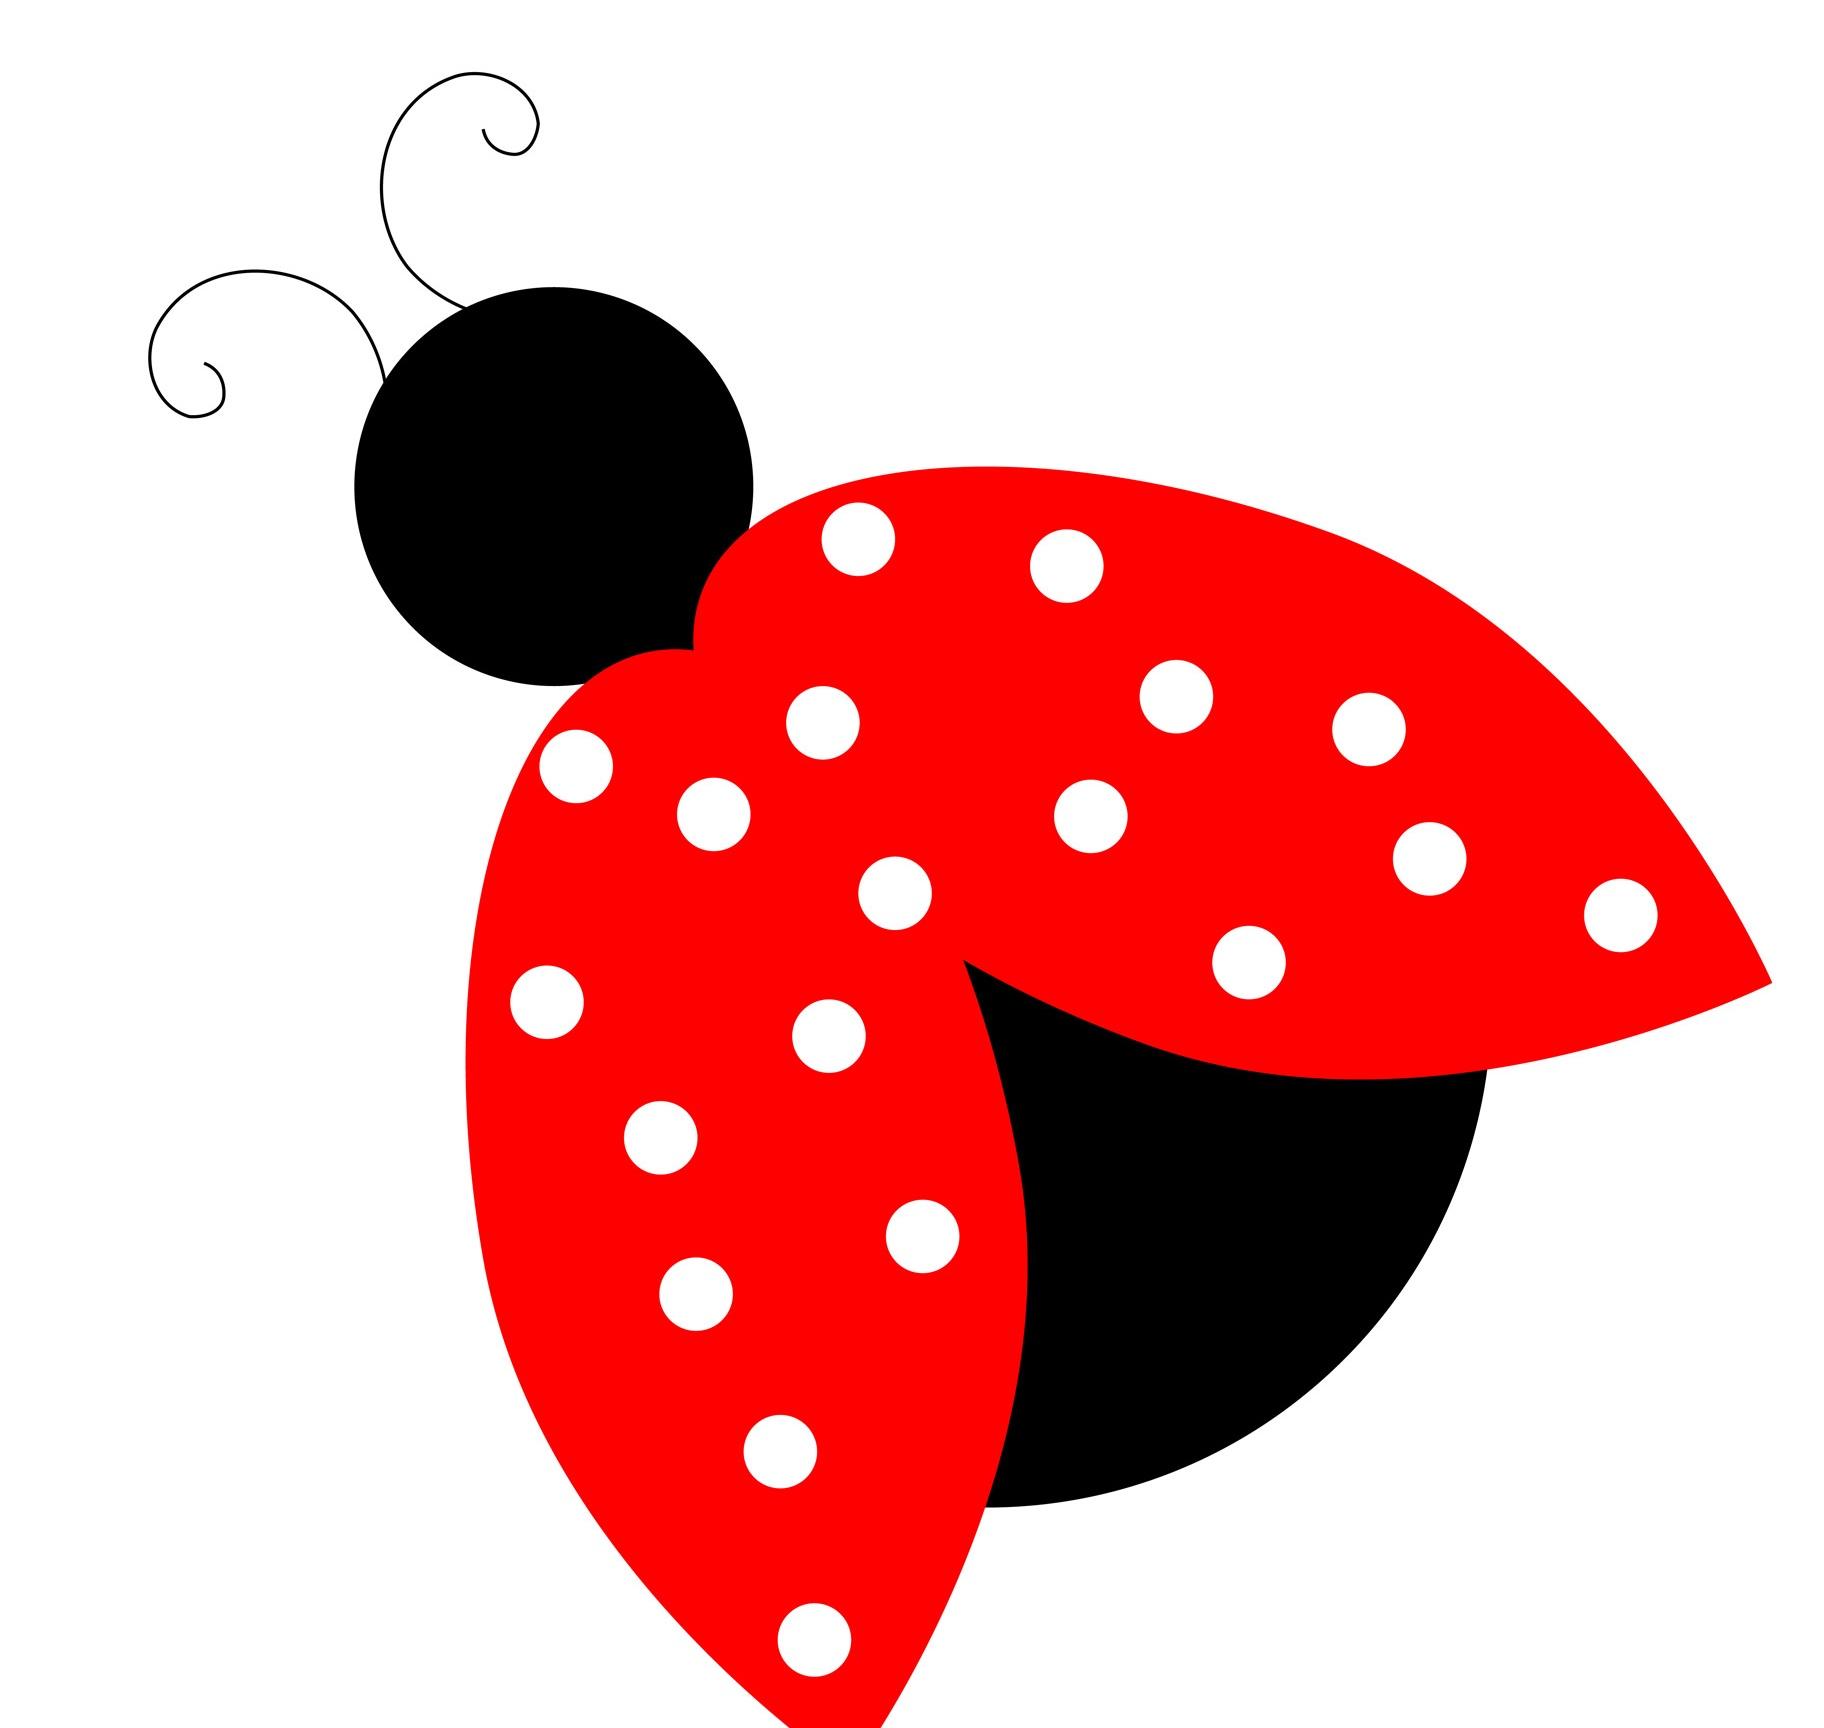 Ladybug lady bug clip art at vector image